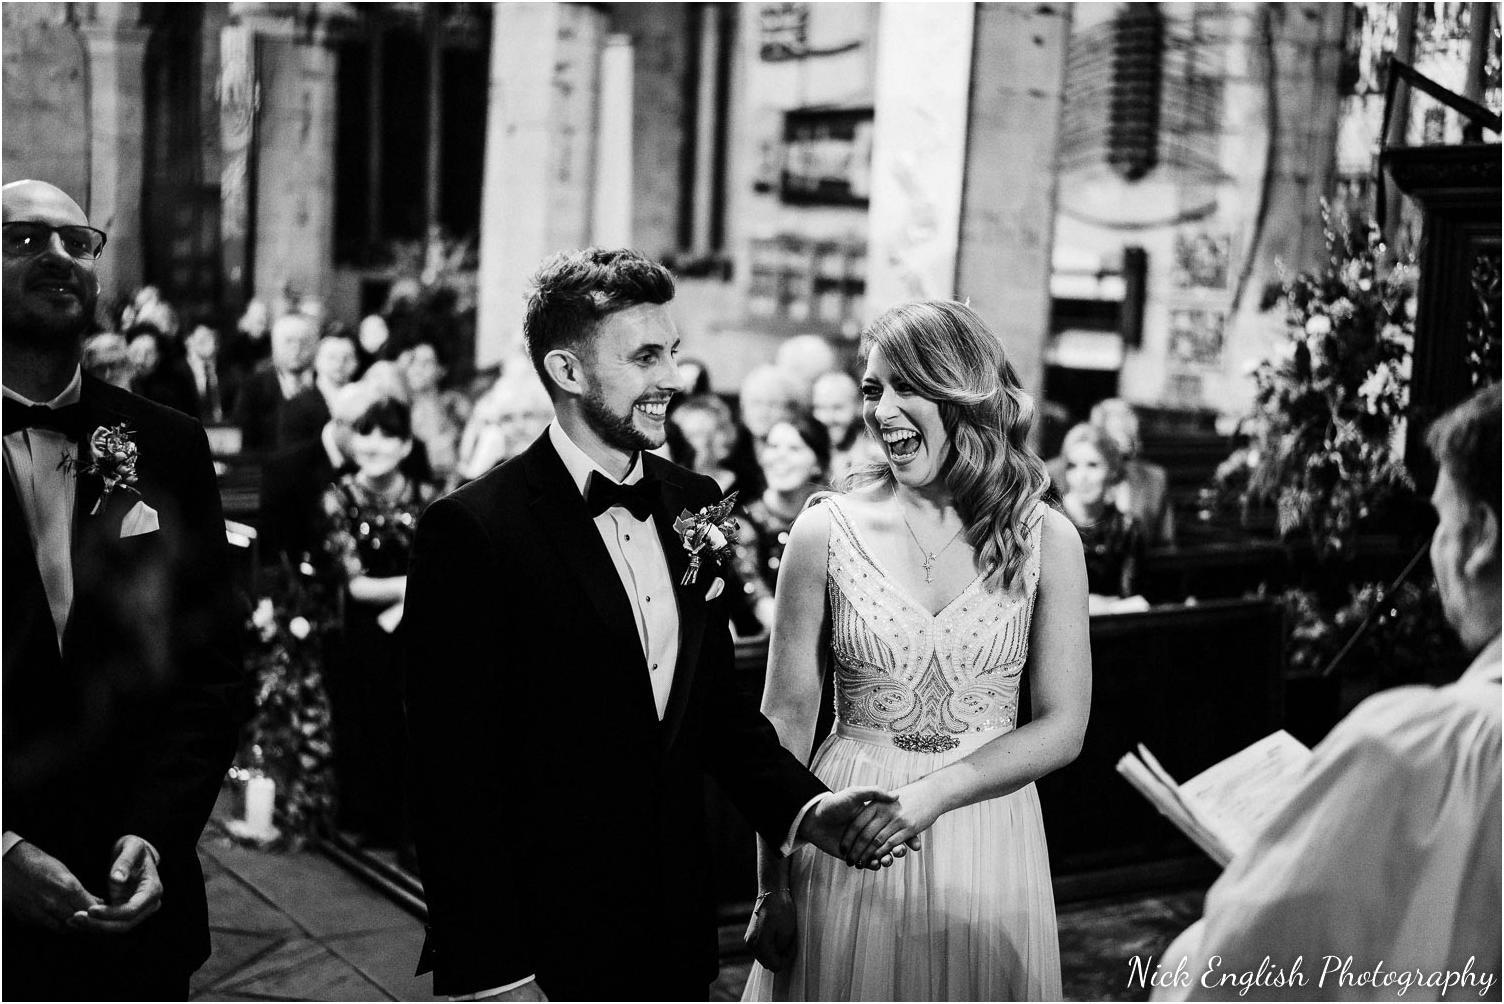 Mitton_Hall_Christmas_Winter_Wedding-28.jpg